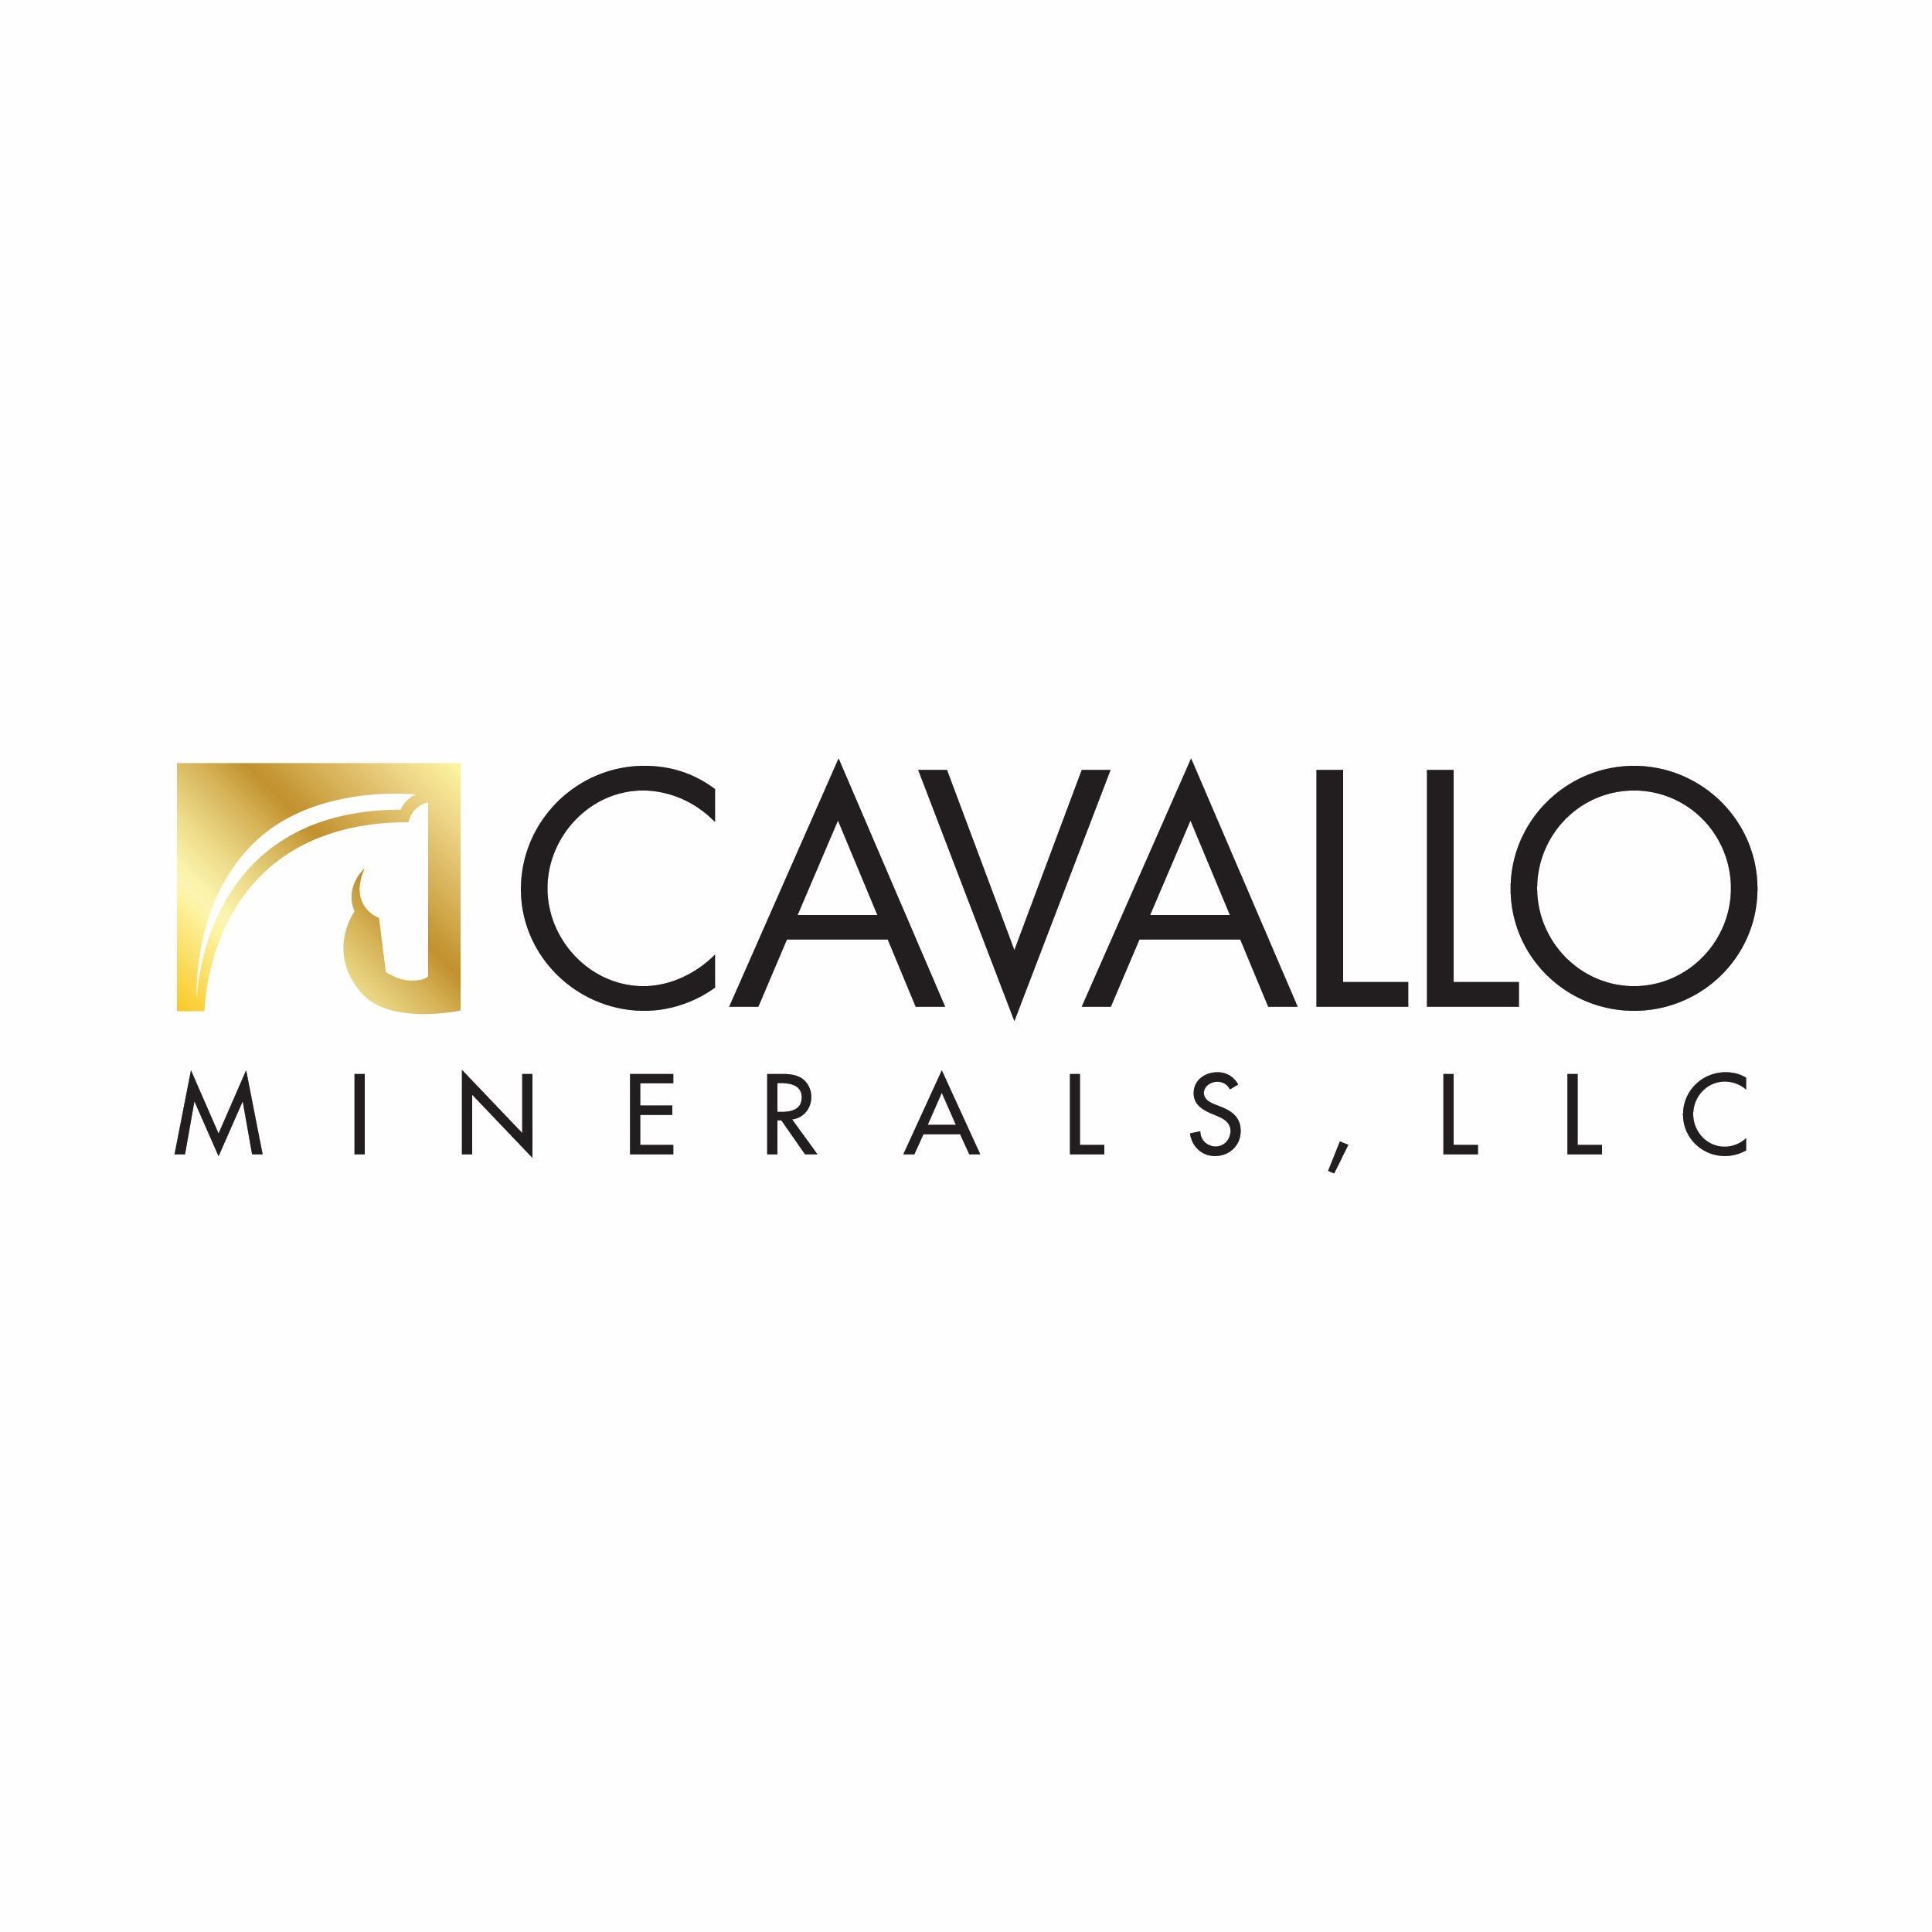 Cavallo Minerals, LLC